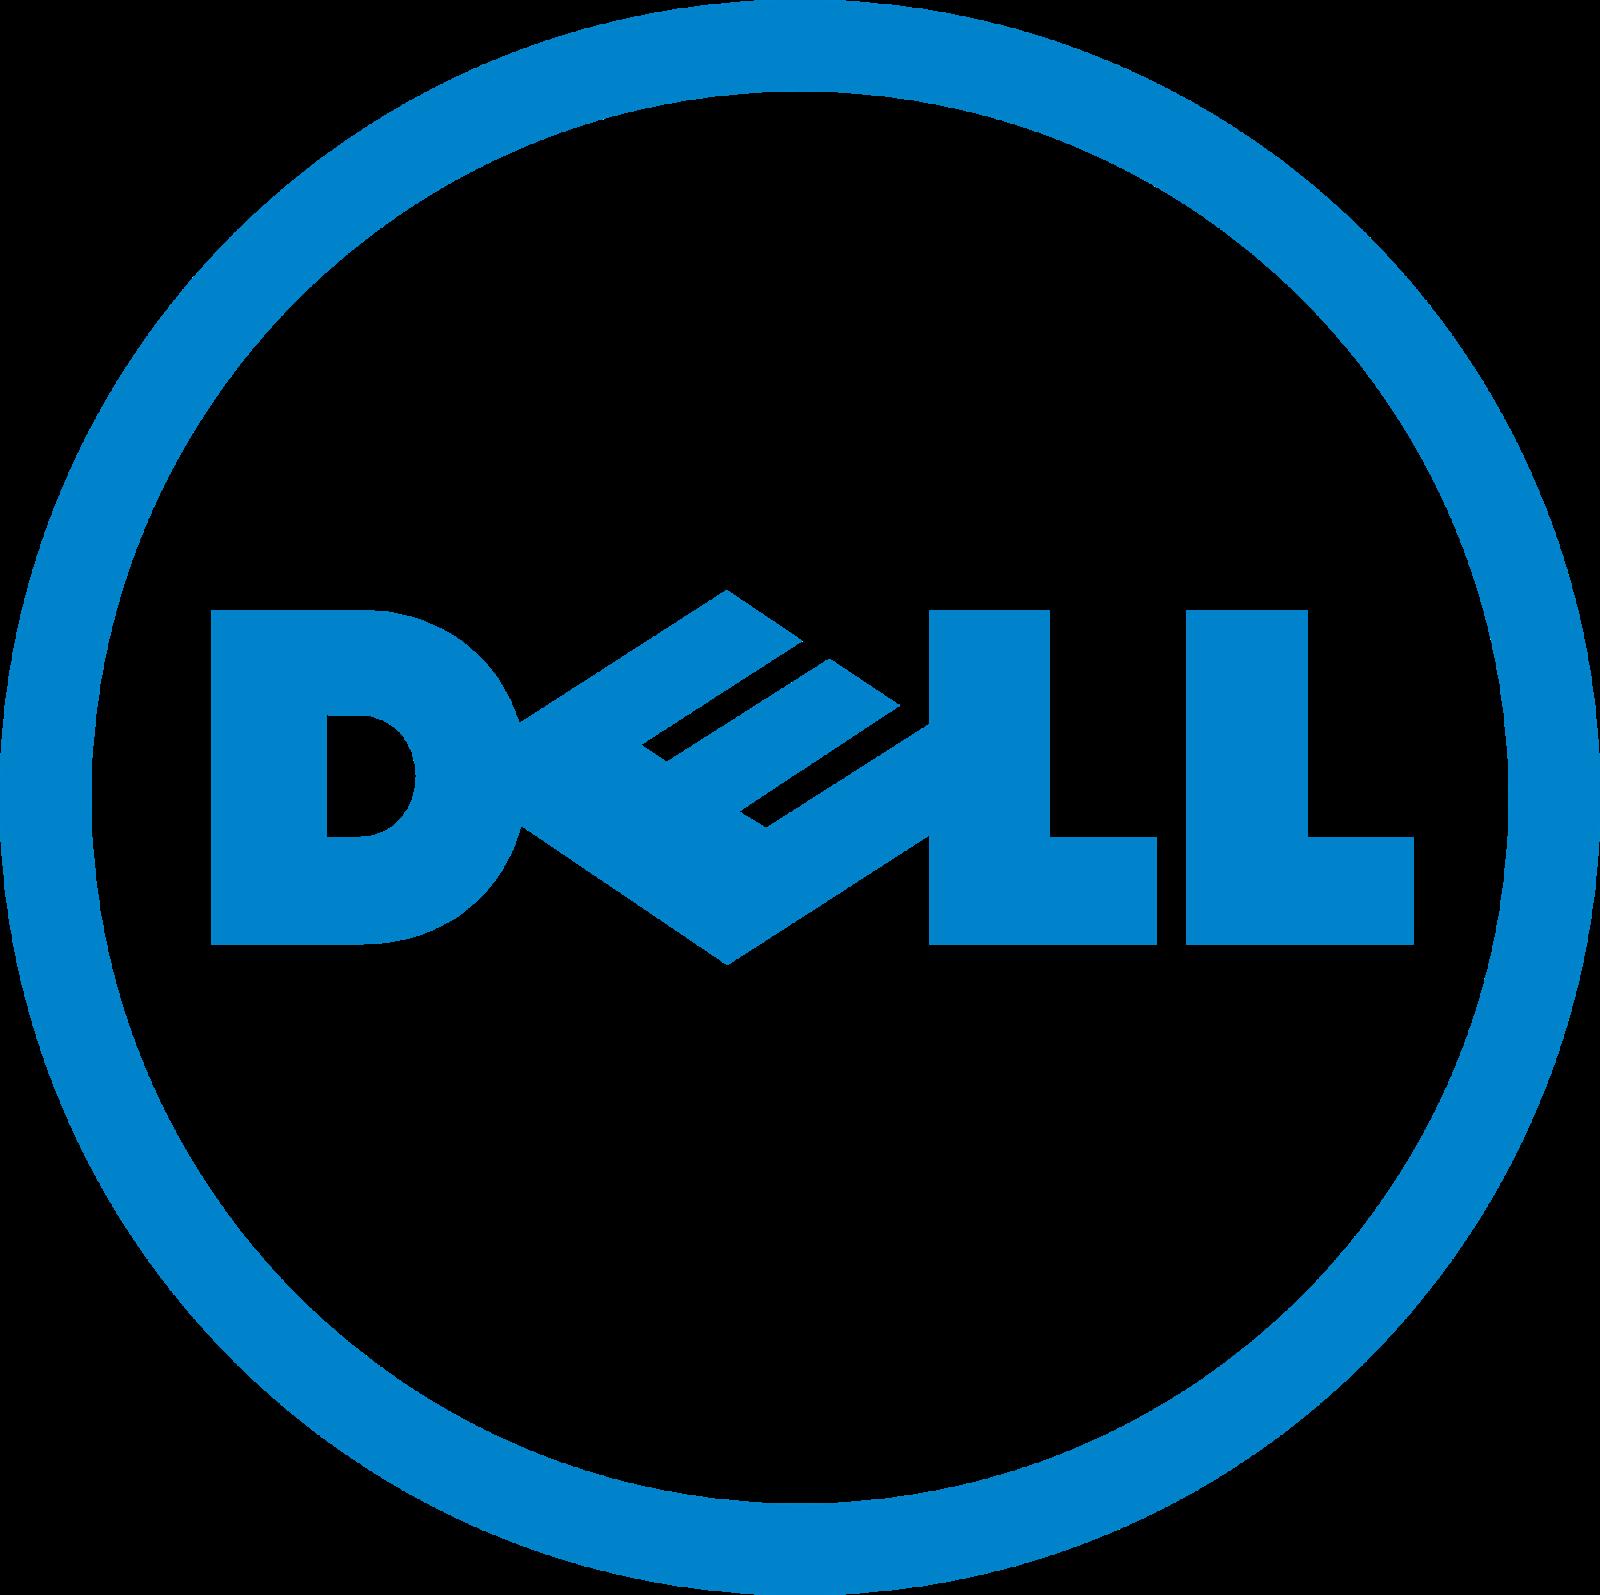 Logo da Empresa Dell